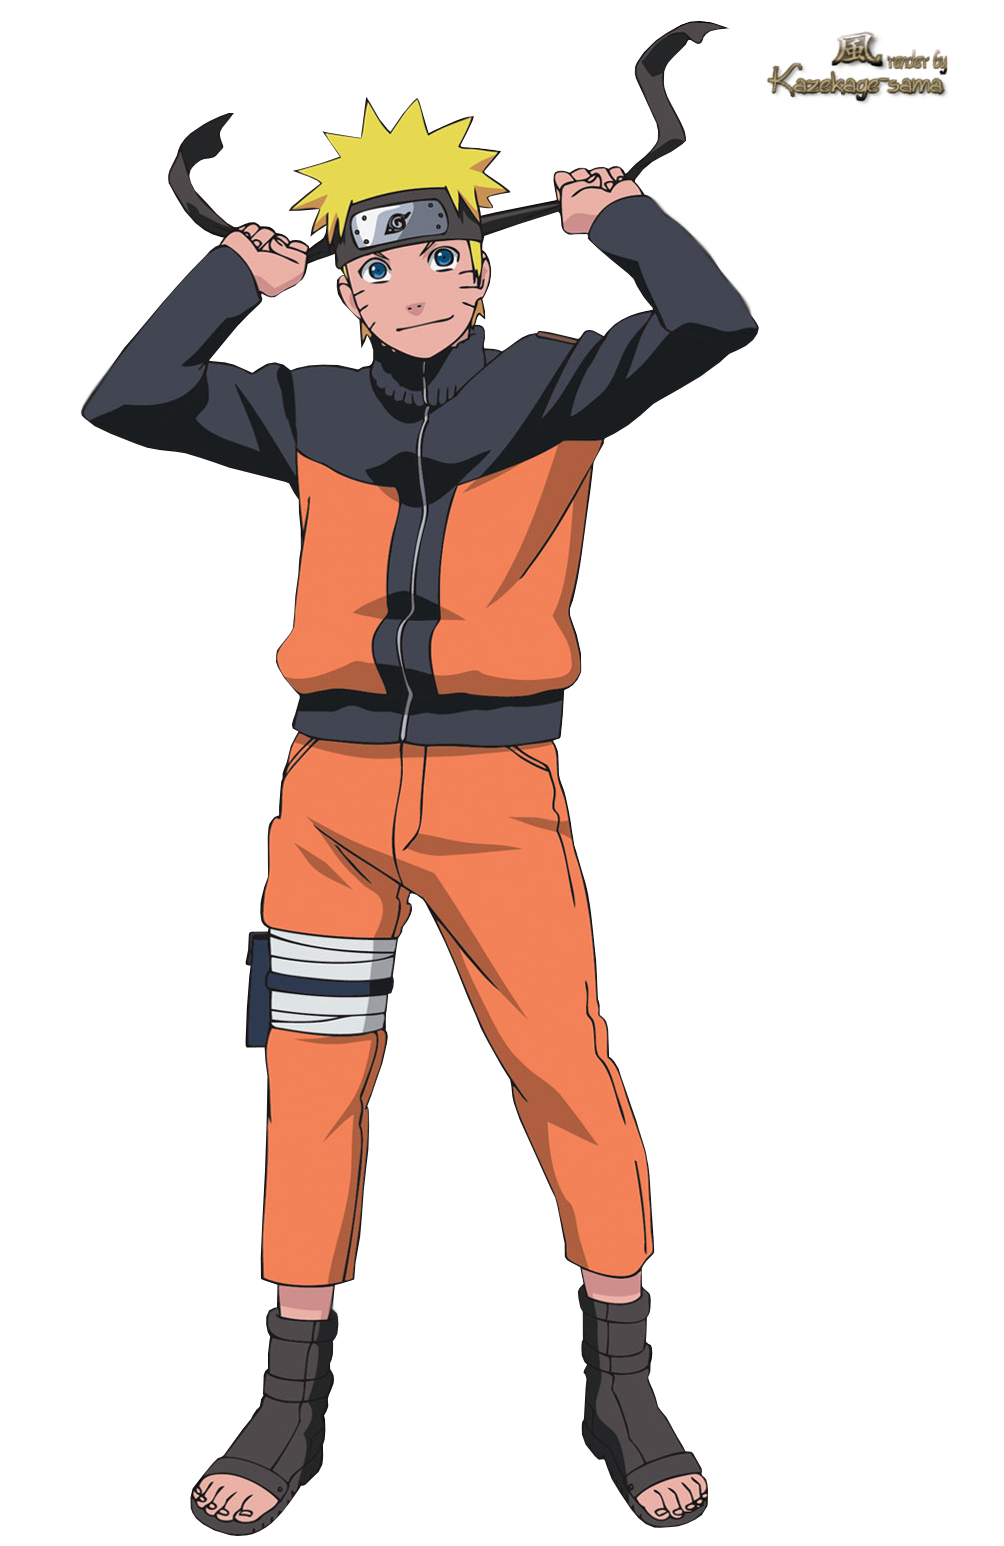 I Naruto Shippuden 3977393 http//newsina.co/4676/i